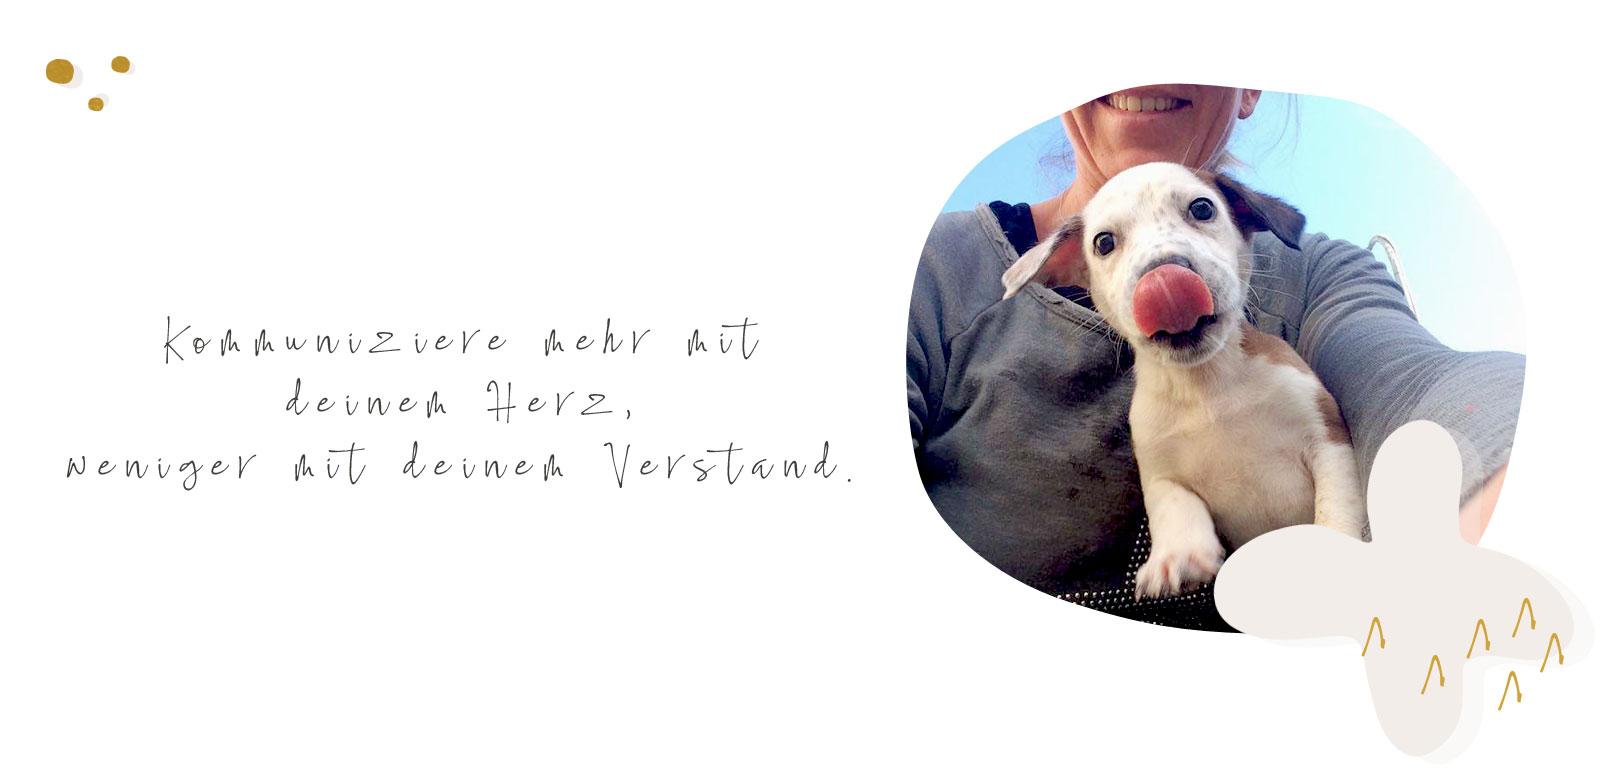 Dog Human Walk Hundeerziehung Hundetraining Hundepsychologie Bitburg Trier Wittlich